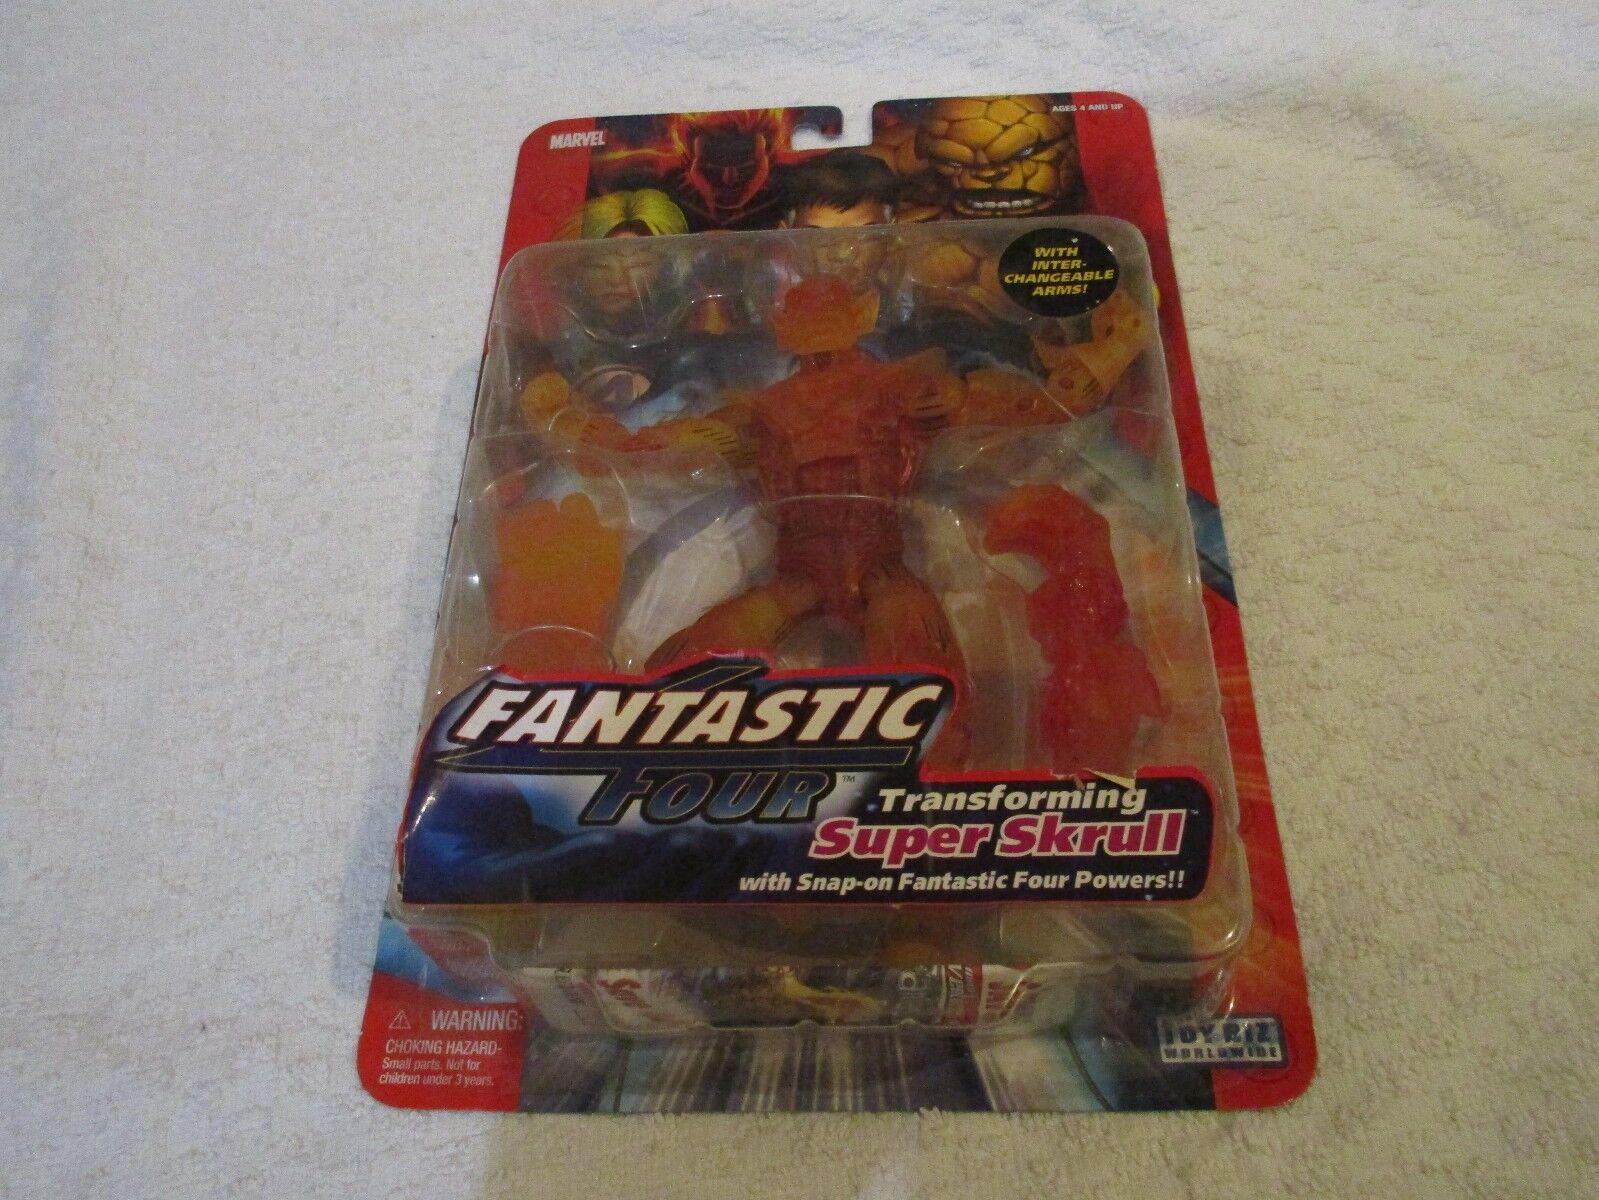 Fantastic Four Classics Series 1 Transforming Super  Skrull Chase Variant Fire  designer en ligne